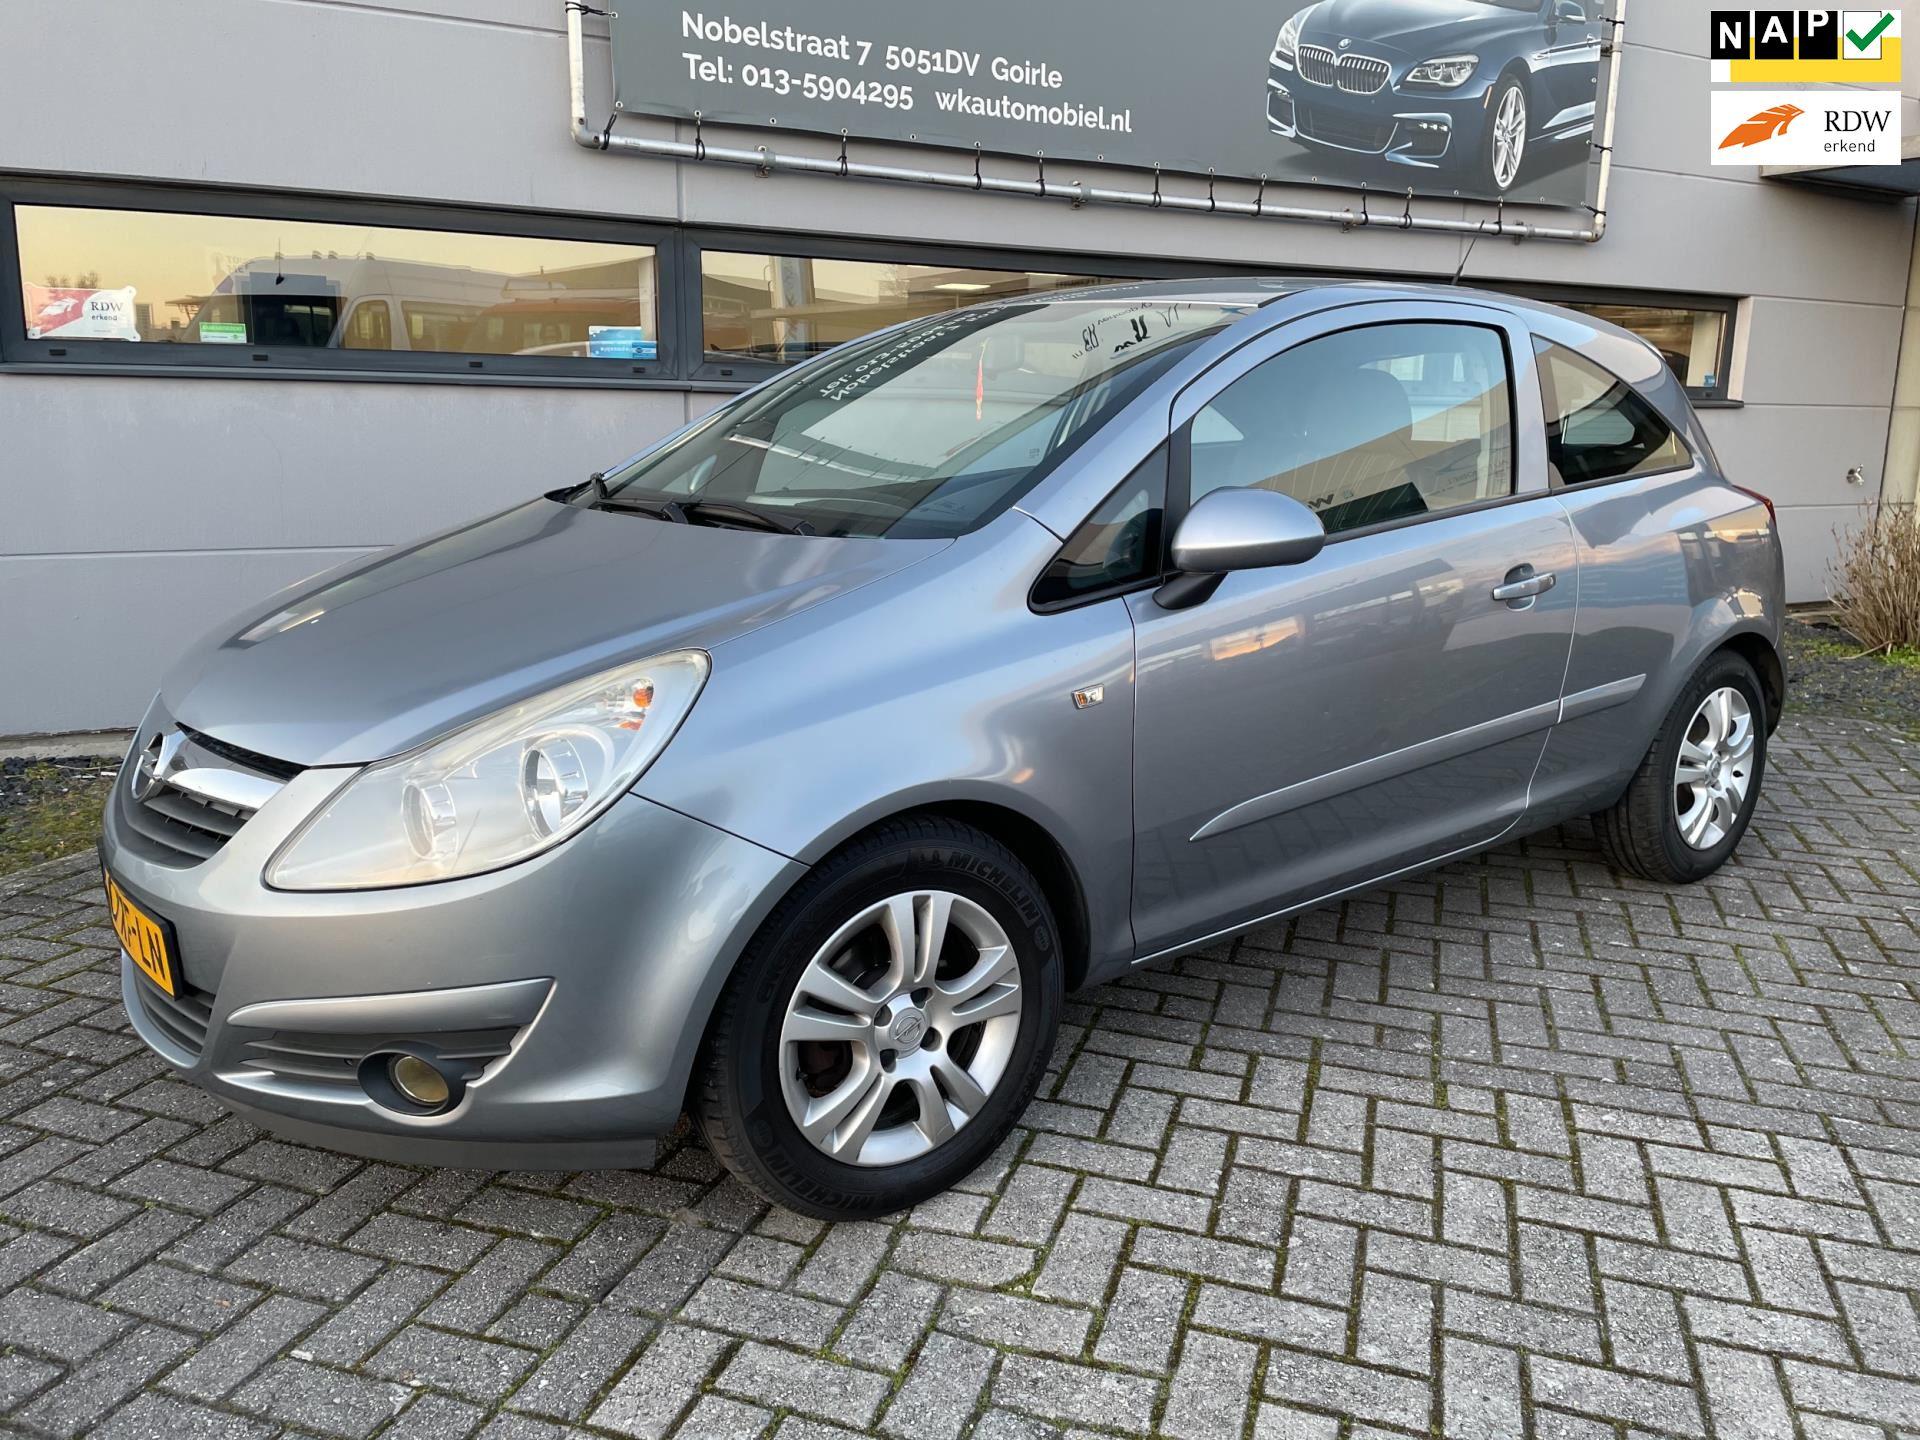 Opel Corsa occasion - WK Automobiel